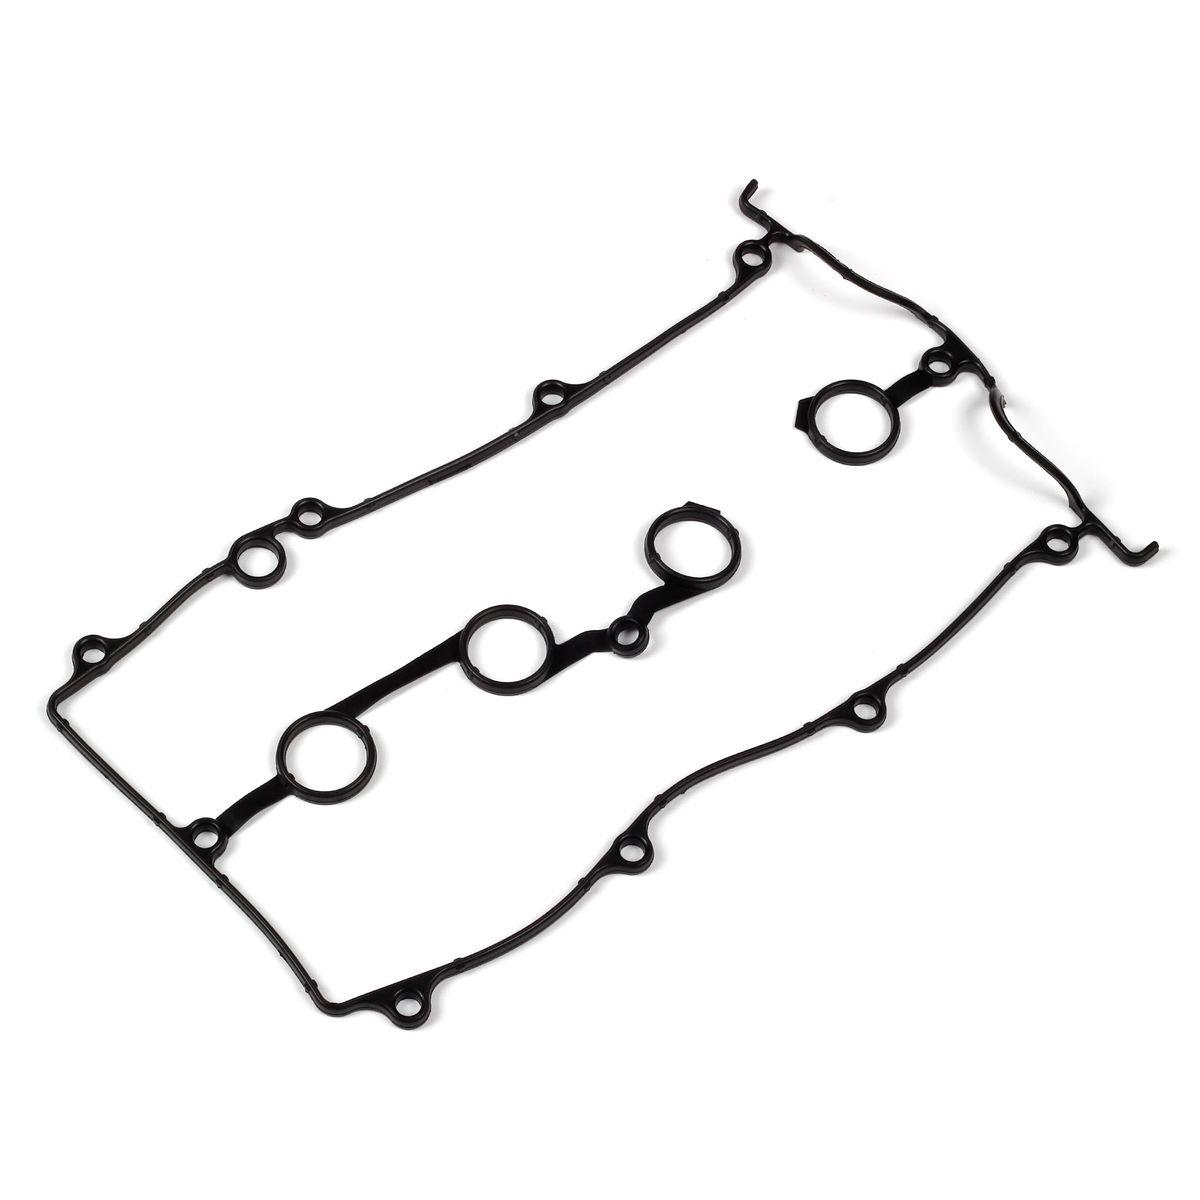 Valve Cover Gasket 09 For Mazda Protege5 2